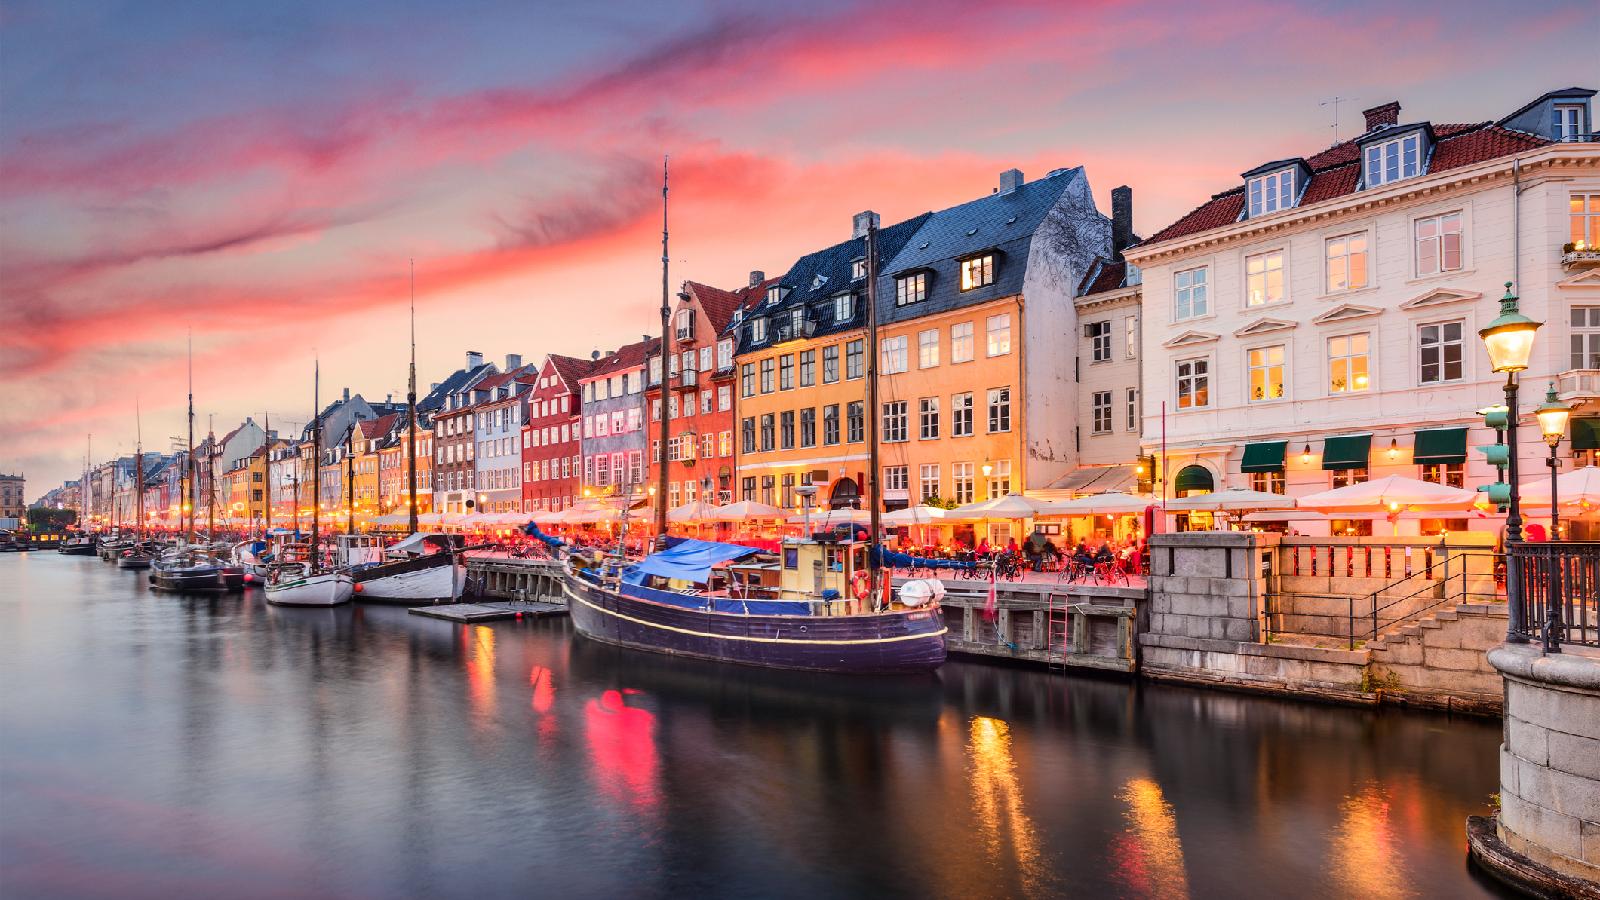 Dänemark hebt alle Maßnahmen auf